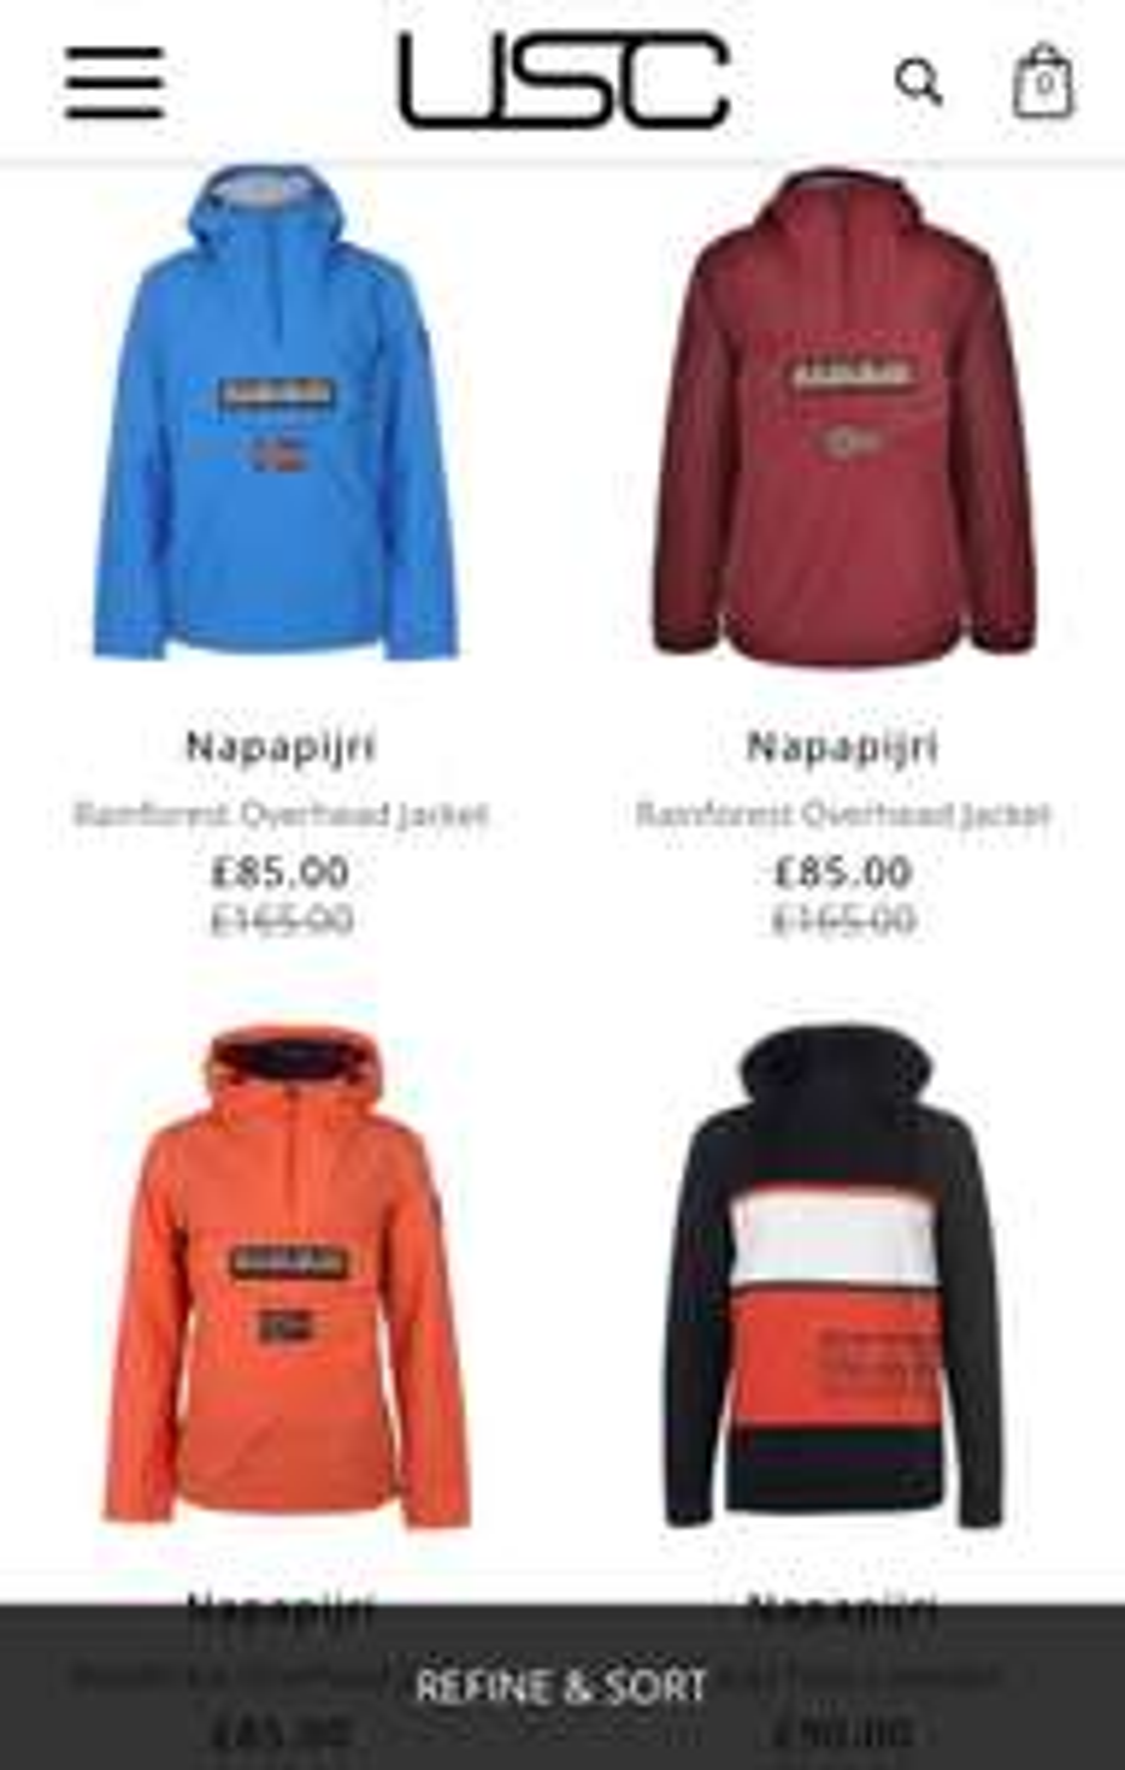 Napapijri Clothing available at USC